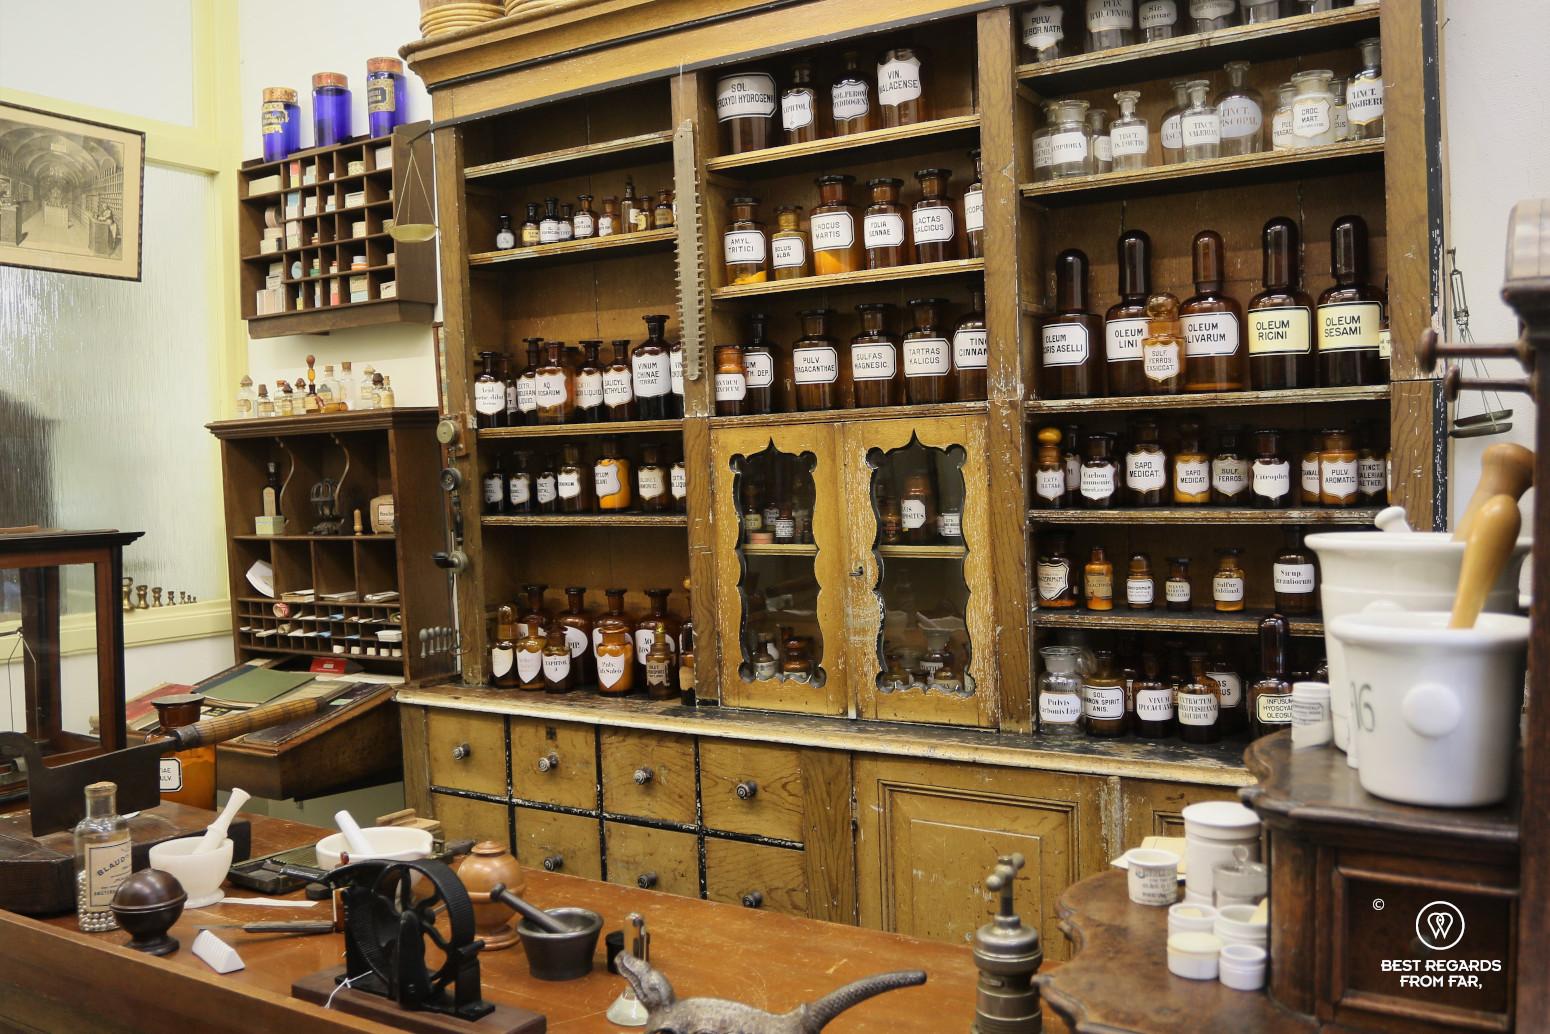 Old pharmacy at Medisch farmaceutisch museum de griffioen, Delft, The Netherlands